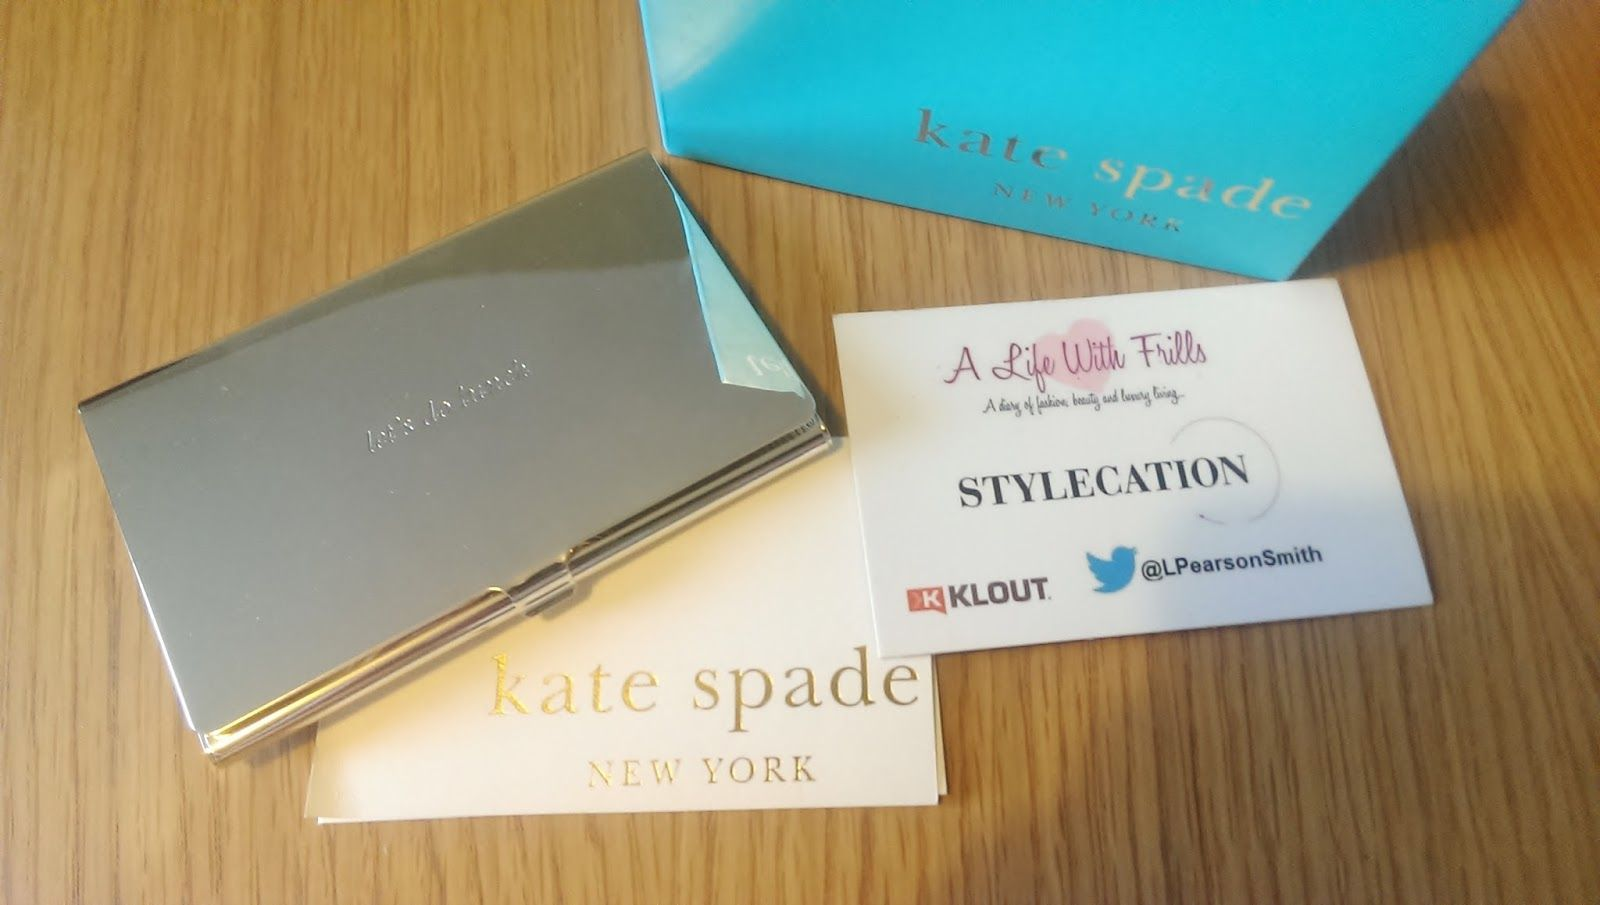 Nice Kate Spade Business Card Contemporary - Business Card Ideas ...